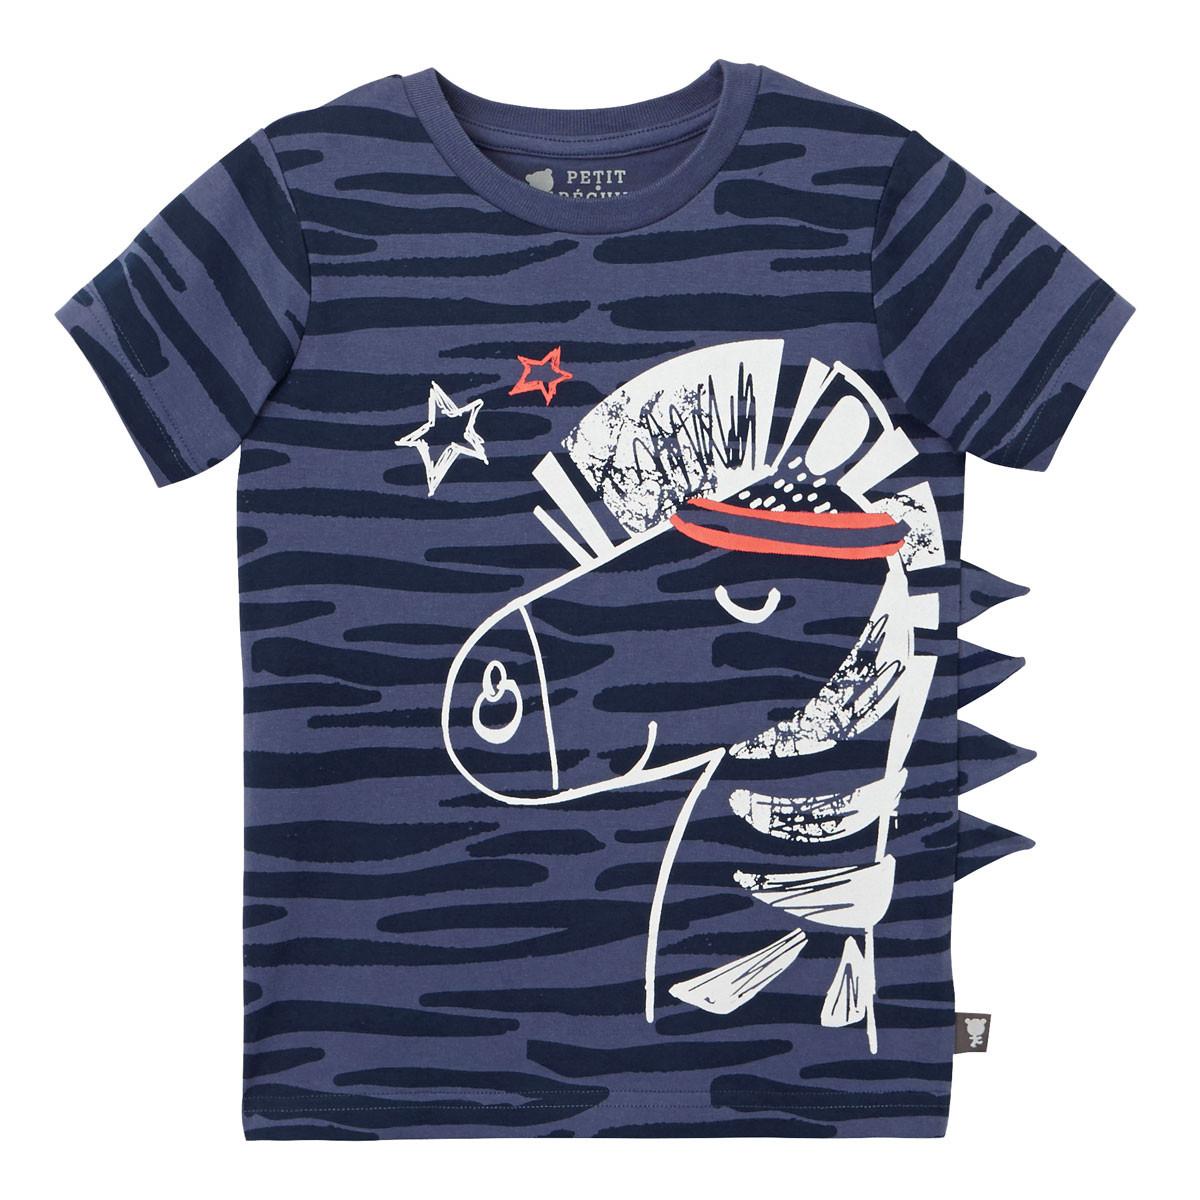 Lot de 2 pyjamas garçon Super Biscotos t-shirt à crête